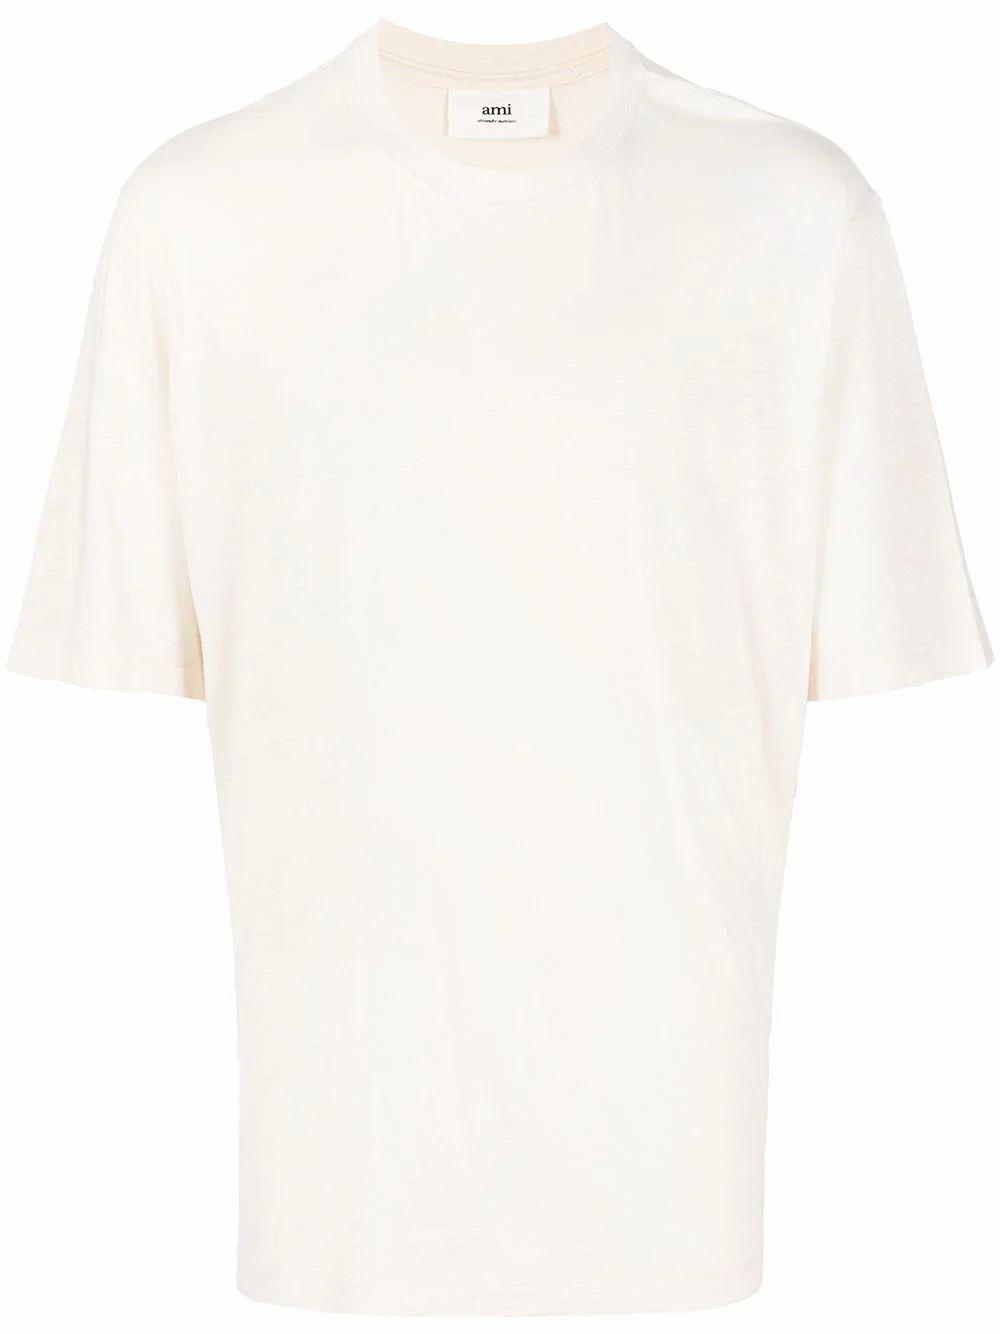 Ami Alexandre Mattiussi T-shirts AMI ALEXANDRE MATTIUSSI MEN'S BEIGE COTTON T-SHIRT